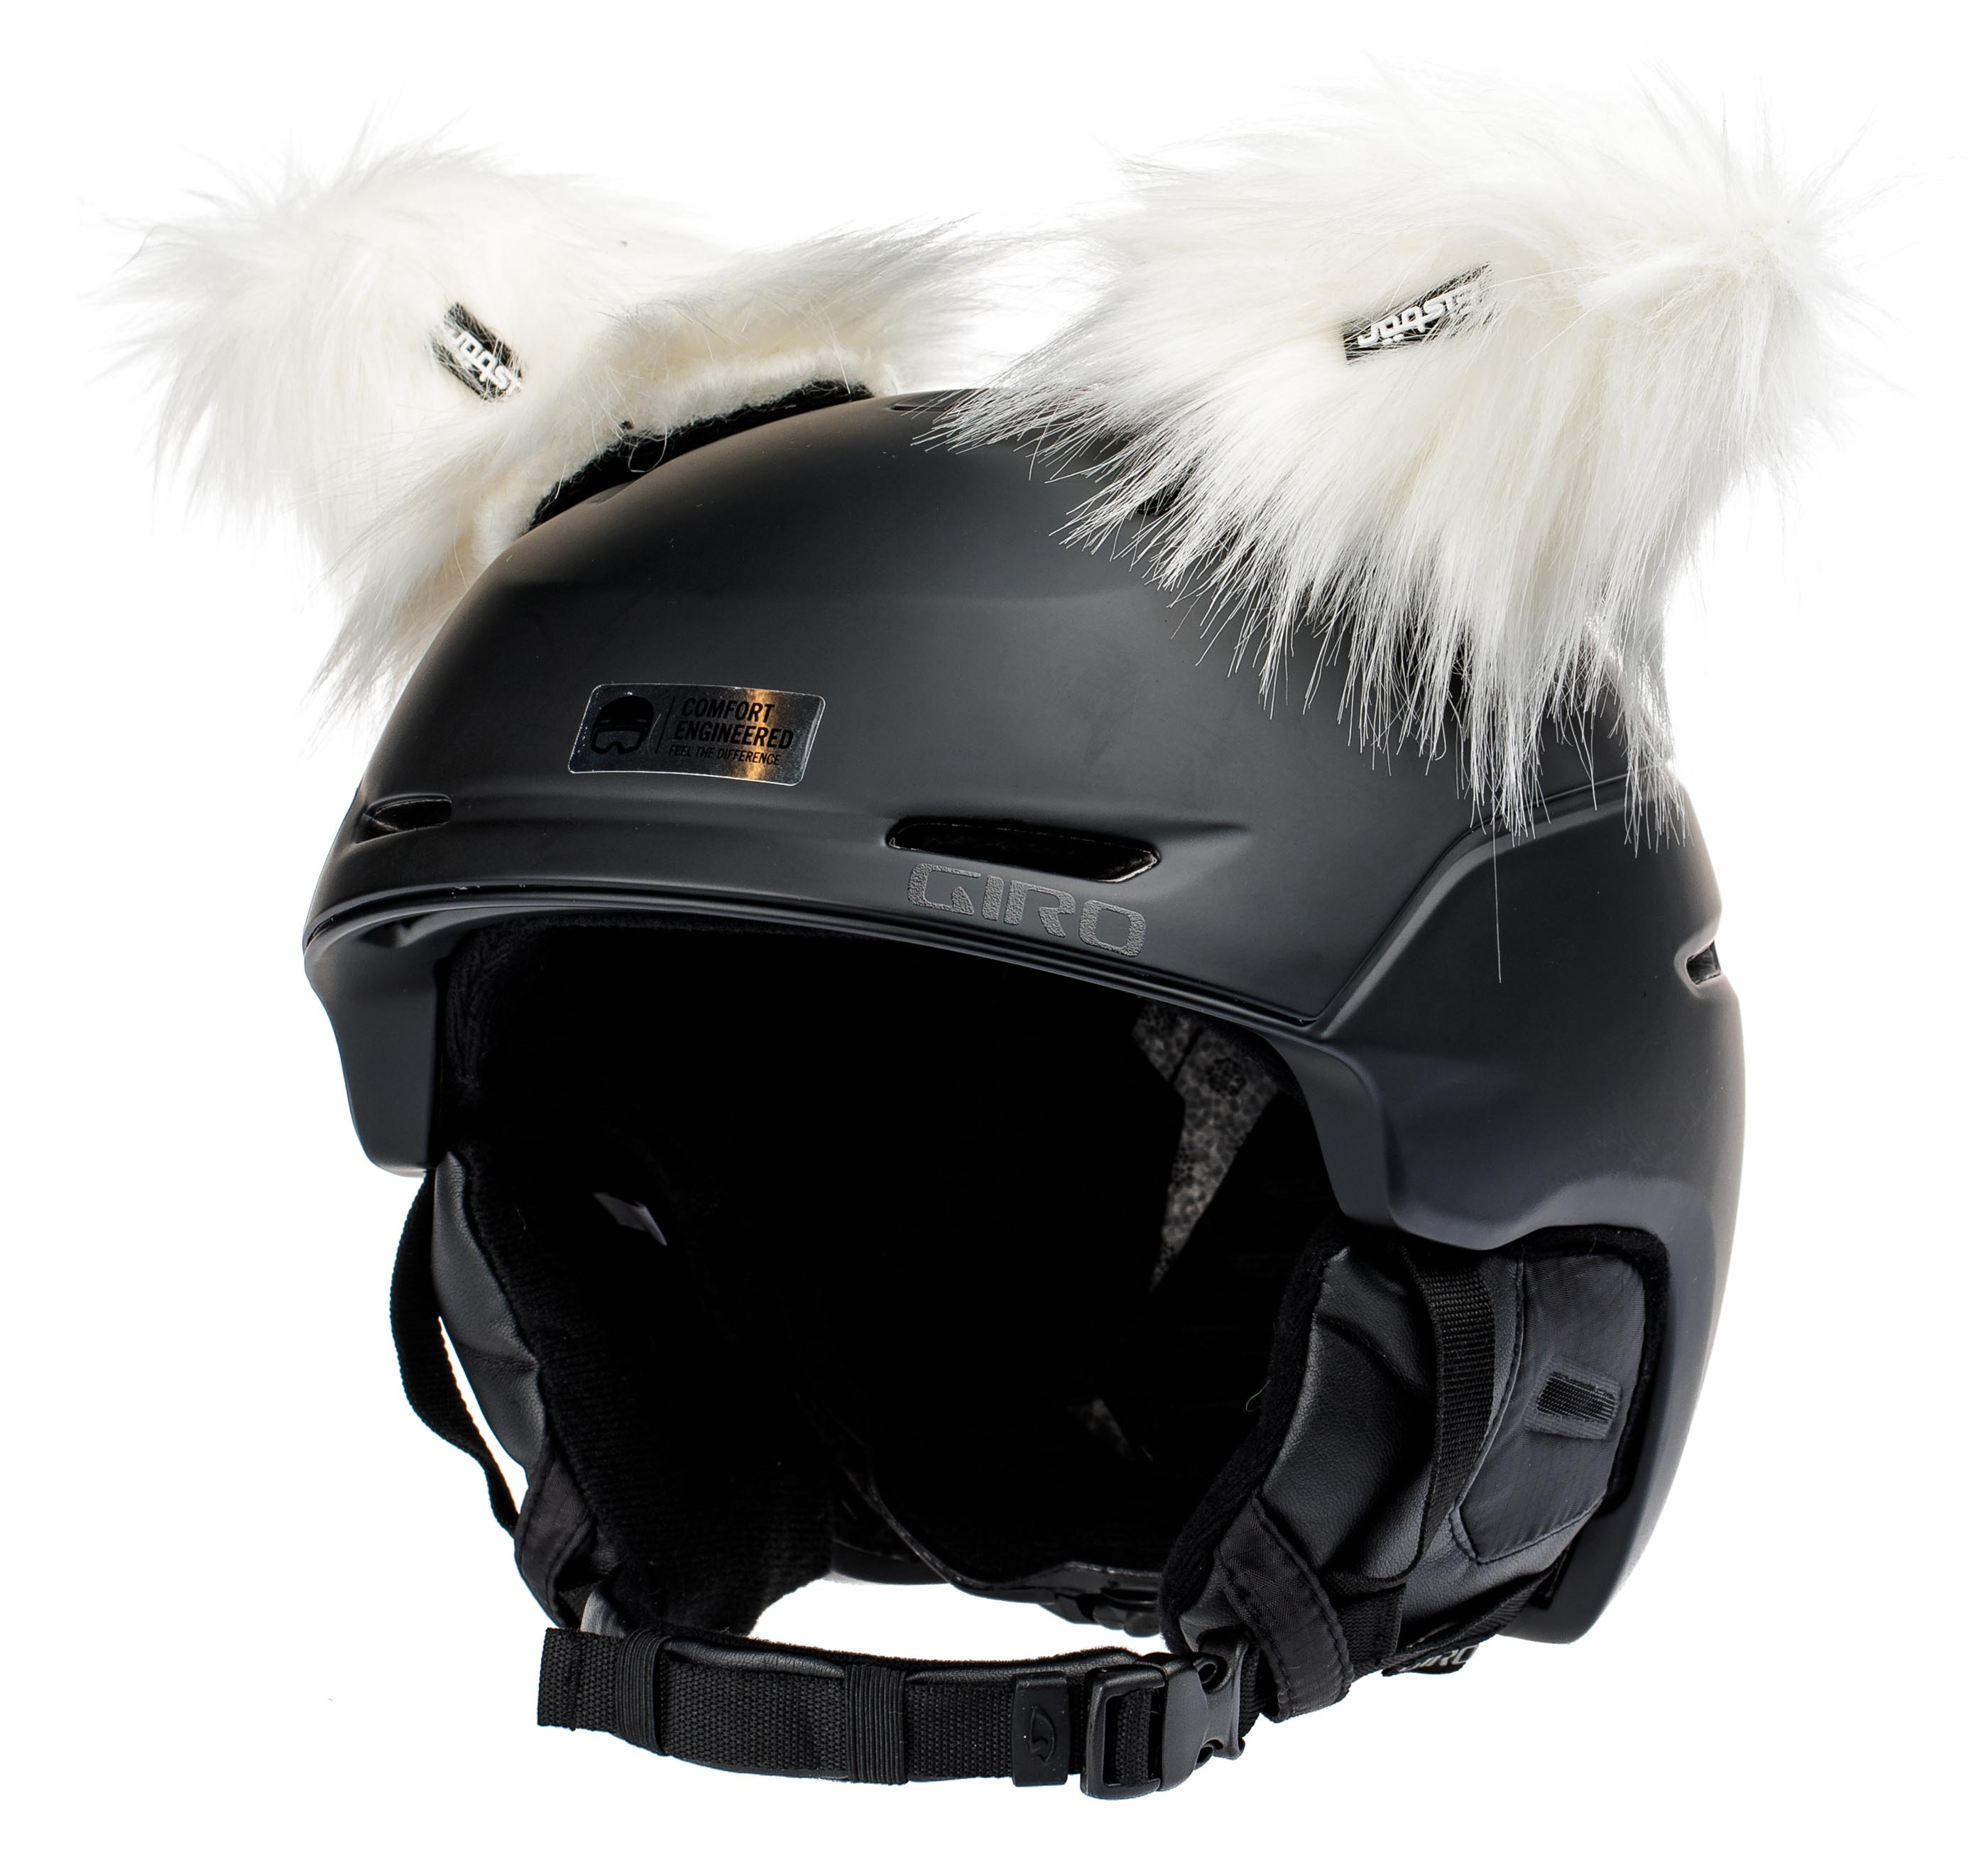 Аксессуар для шлема Helmet Lux Horn Eisbär — фото 4